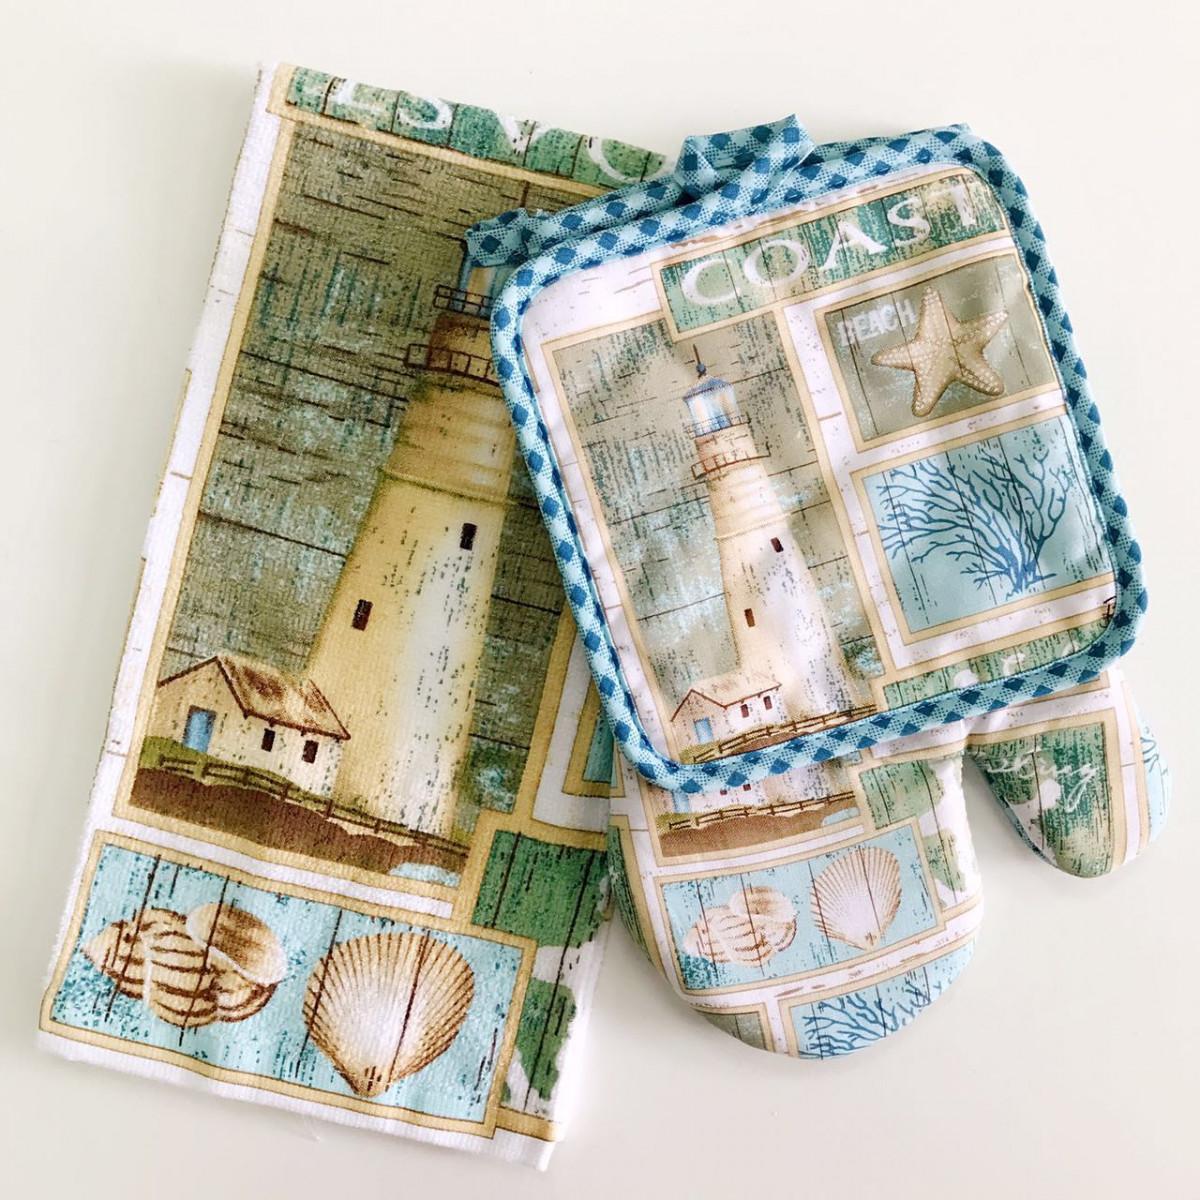 Полотенца Valtery Кухонное полотенце Старый маяк (38х63 см) полотенце bon appetit кухонное махровое жуки 38х63 см печатн